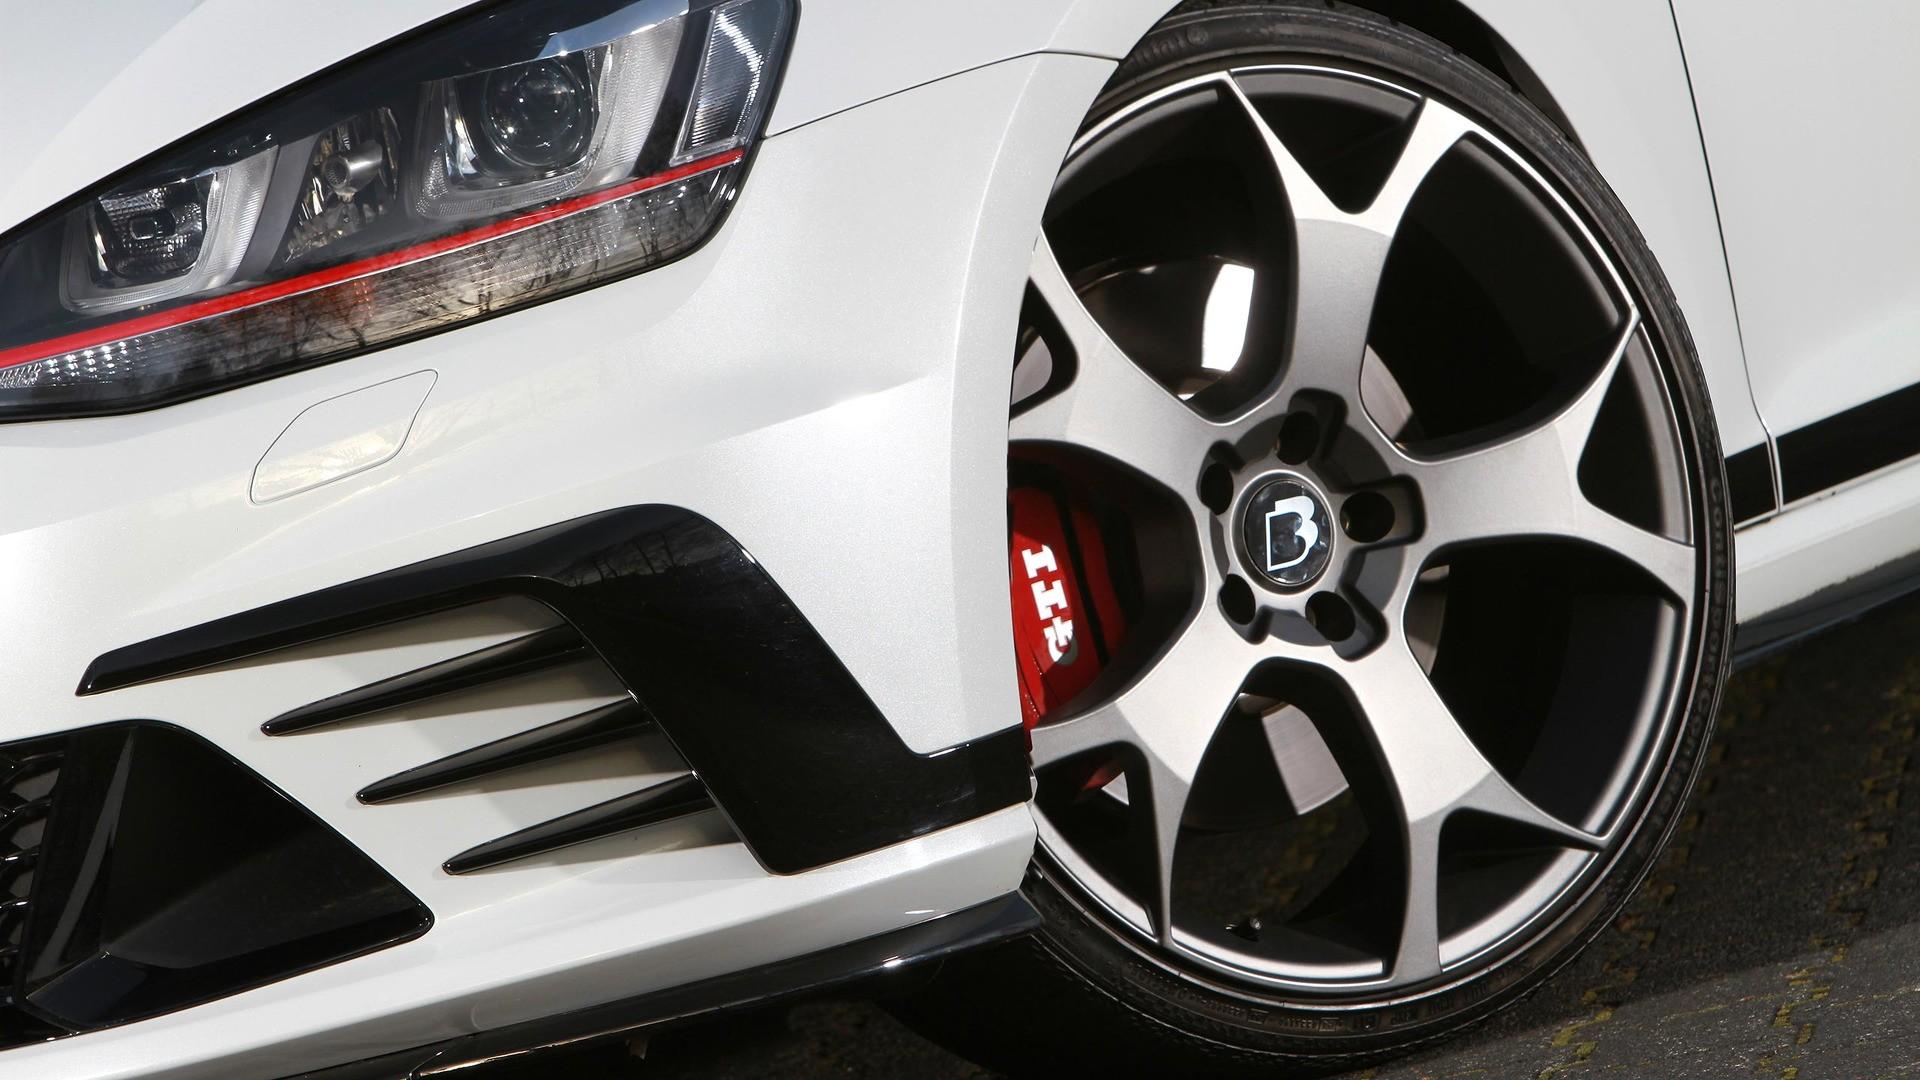 B&B Automobiltechnik Volkswagen Golf GTI Clubsport S: ¡473 CV y 620 Nm de par!